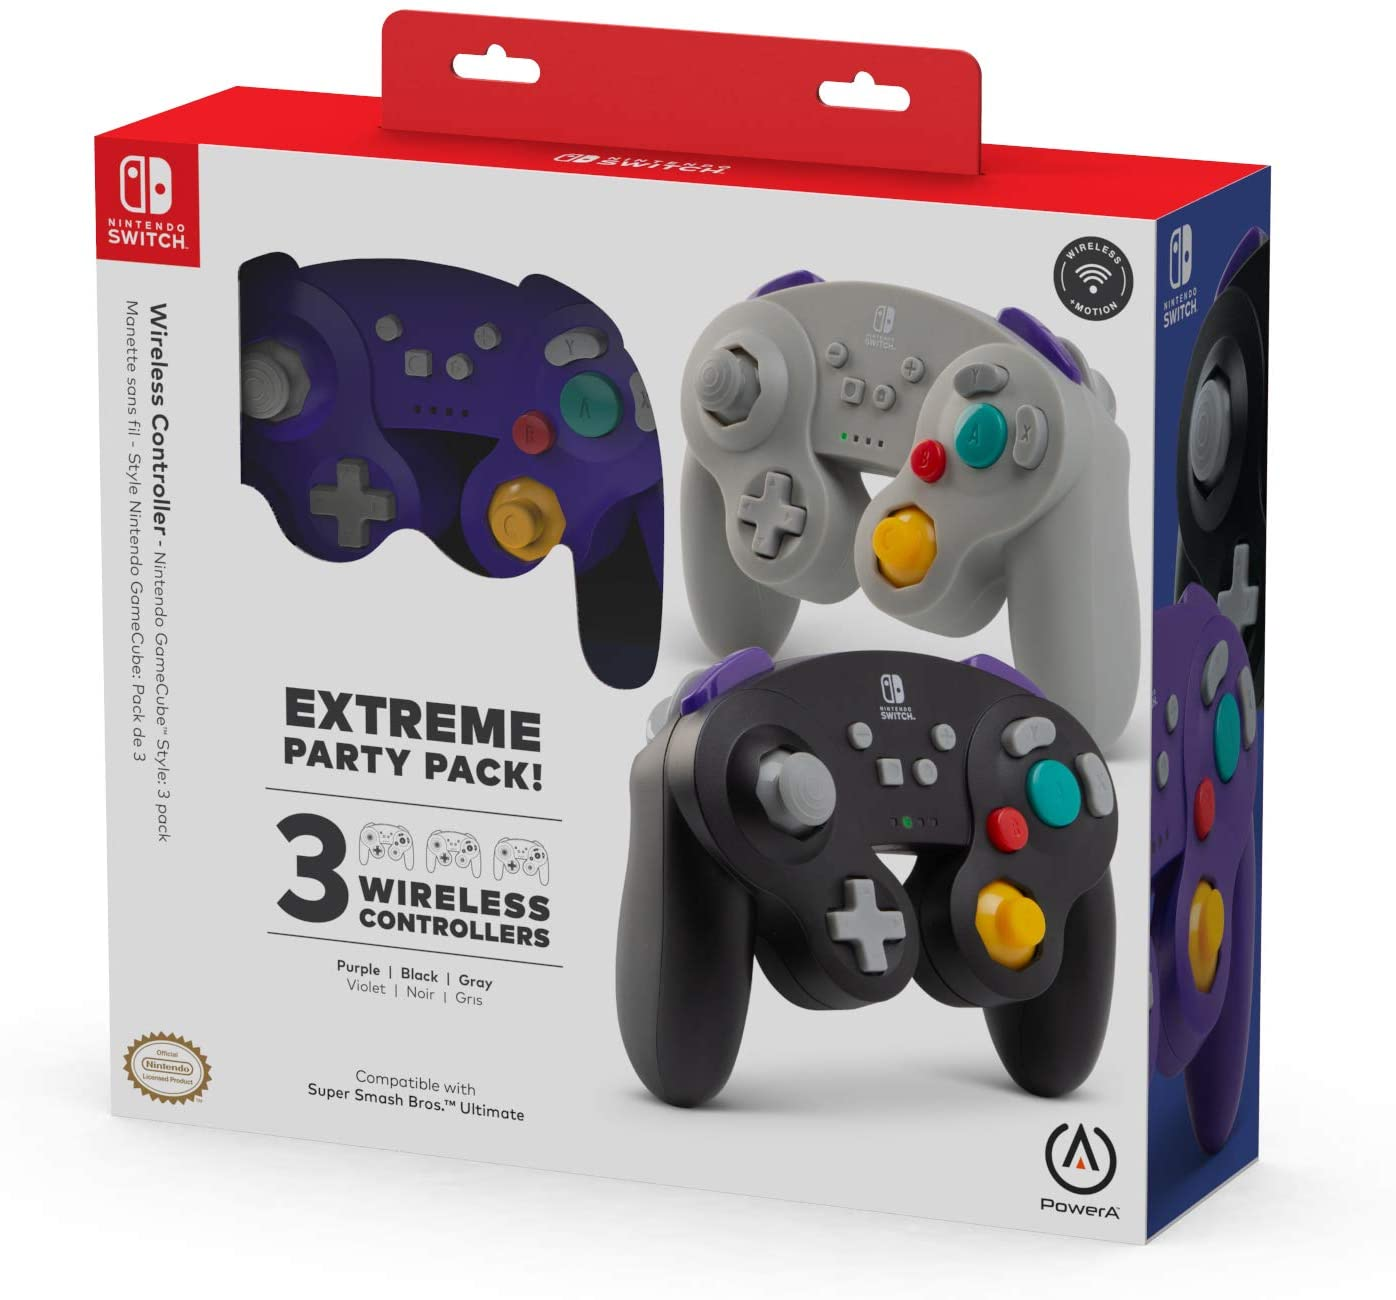 Paquete de 3 controles inalámbricos para Nintendo Switch estilo Game Cube